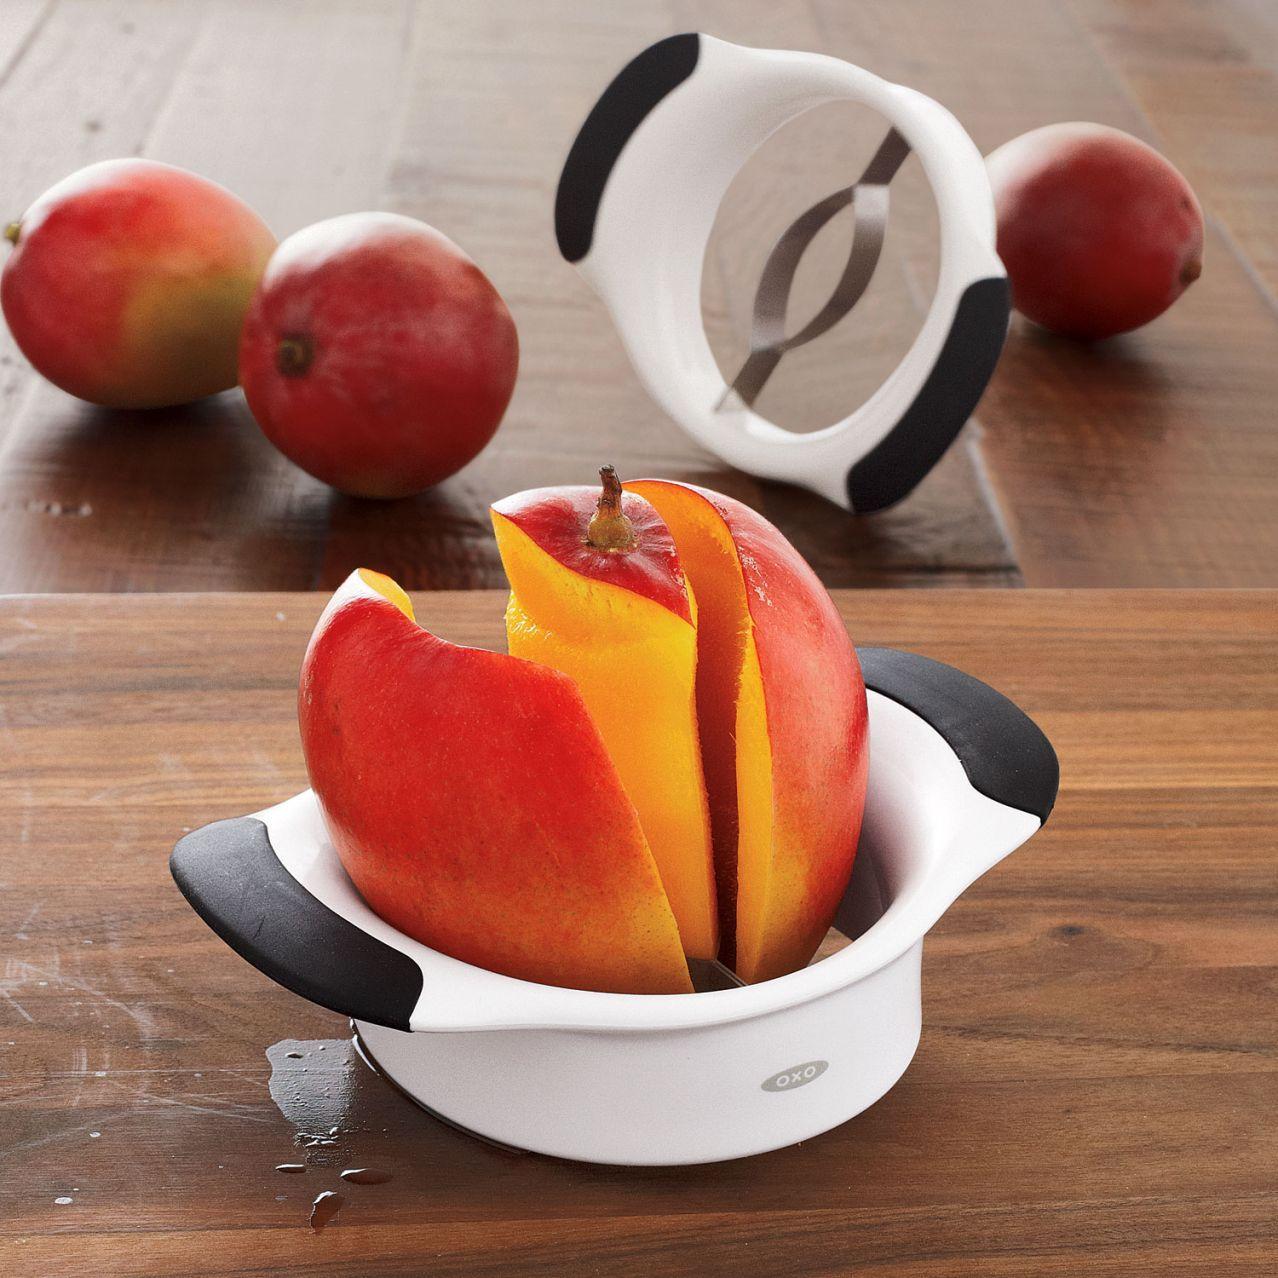 oxo mango splitter sur la table stuff pinterest stylisch und projekte. Black Bedroom Furniture Sets. Home Design Ideas